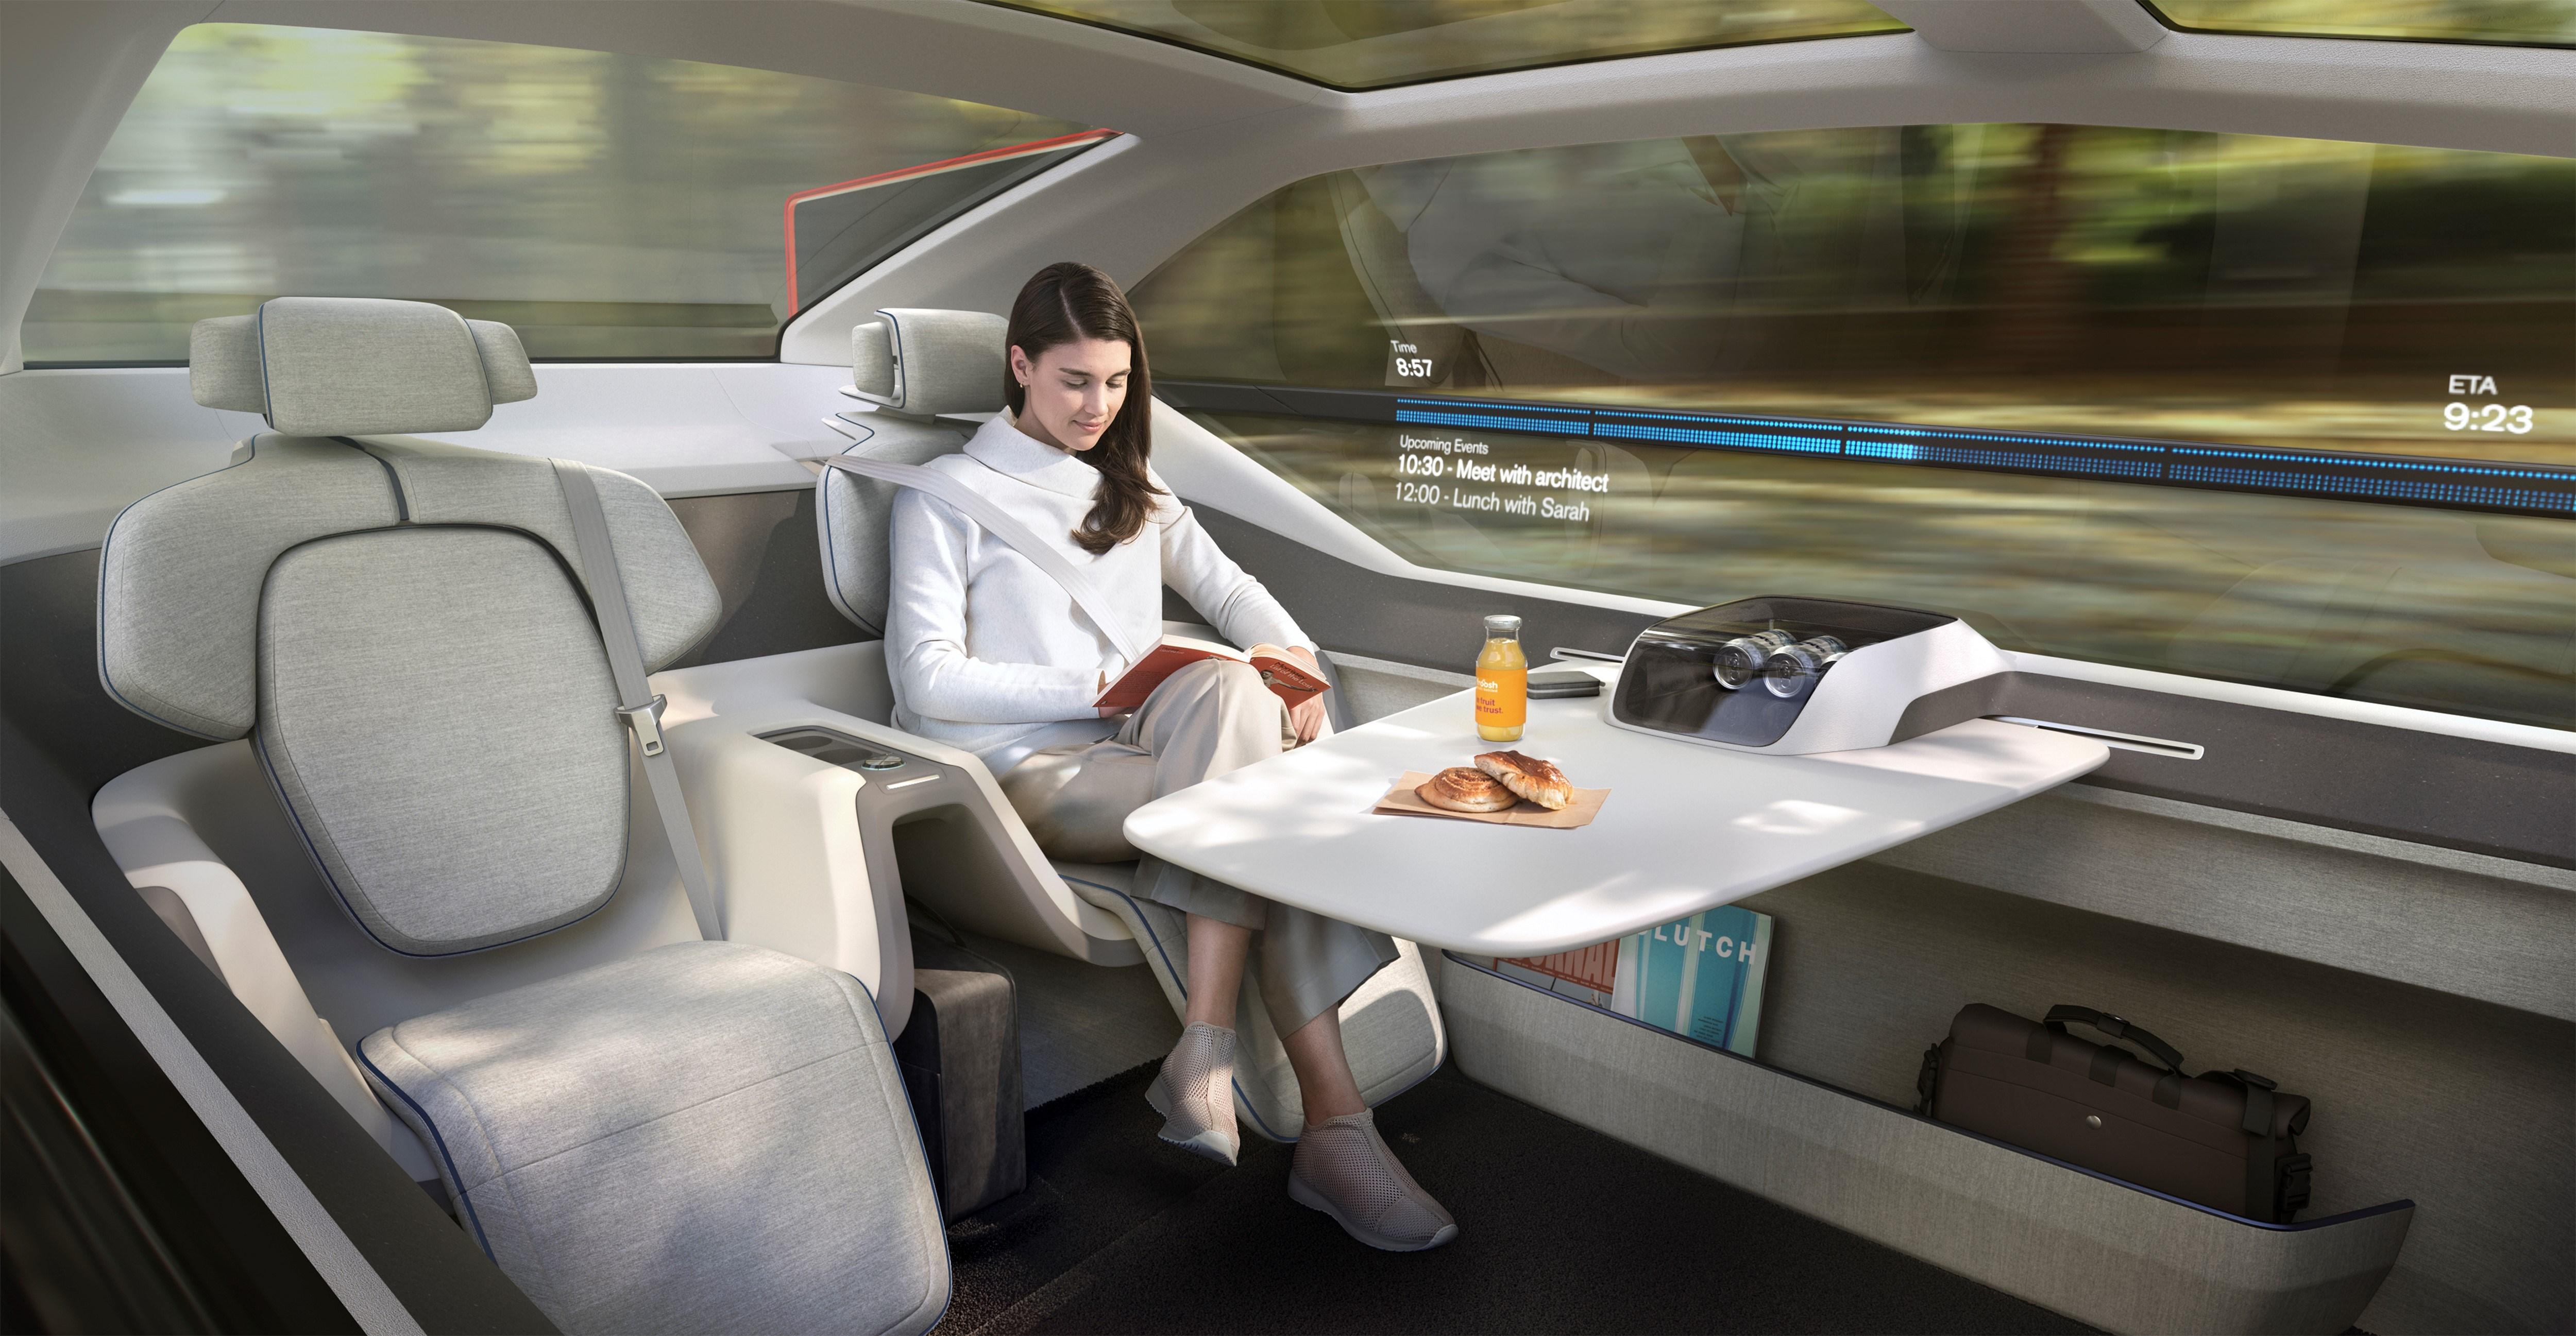 Global Driverless Standard